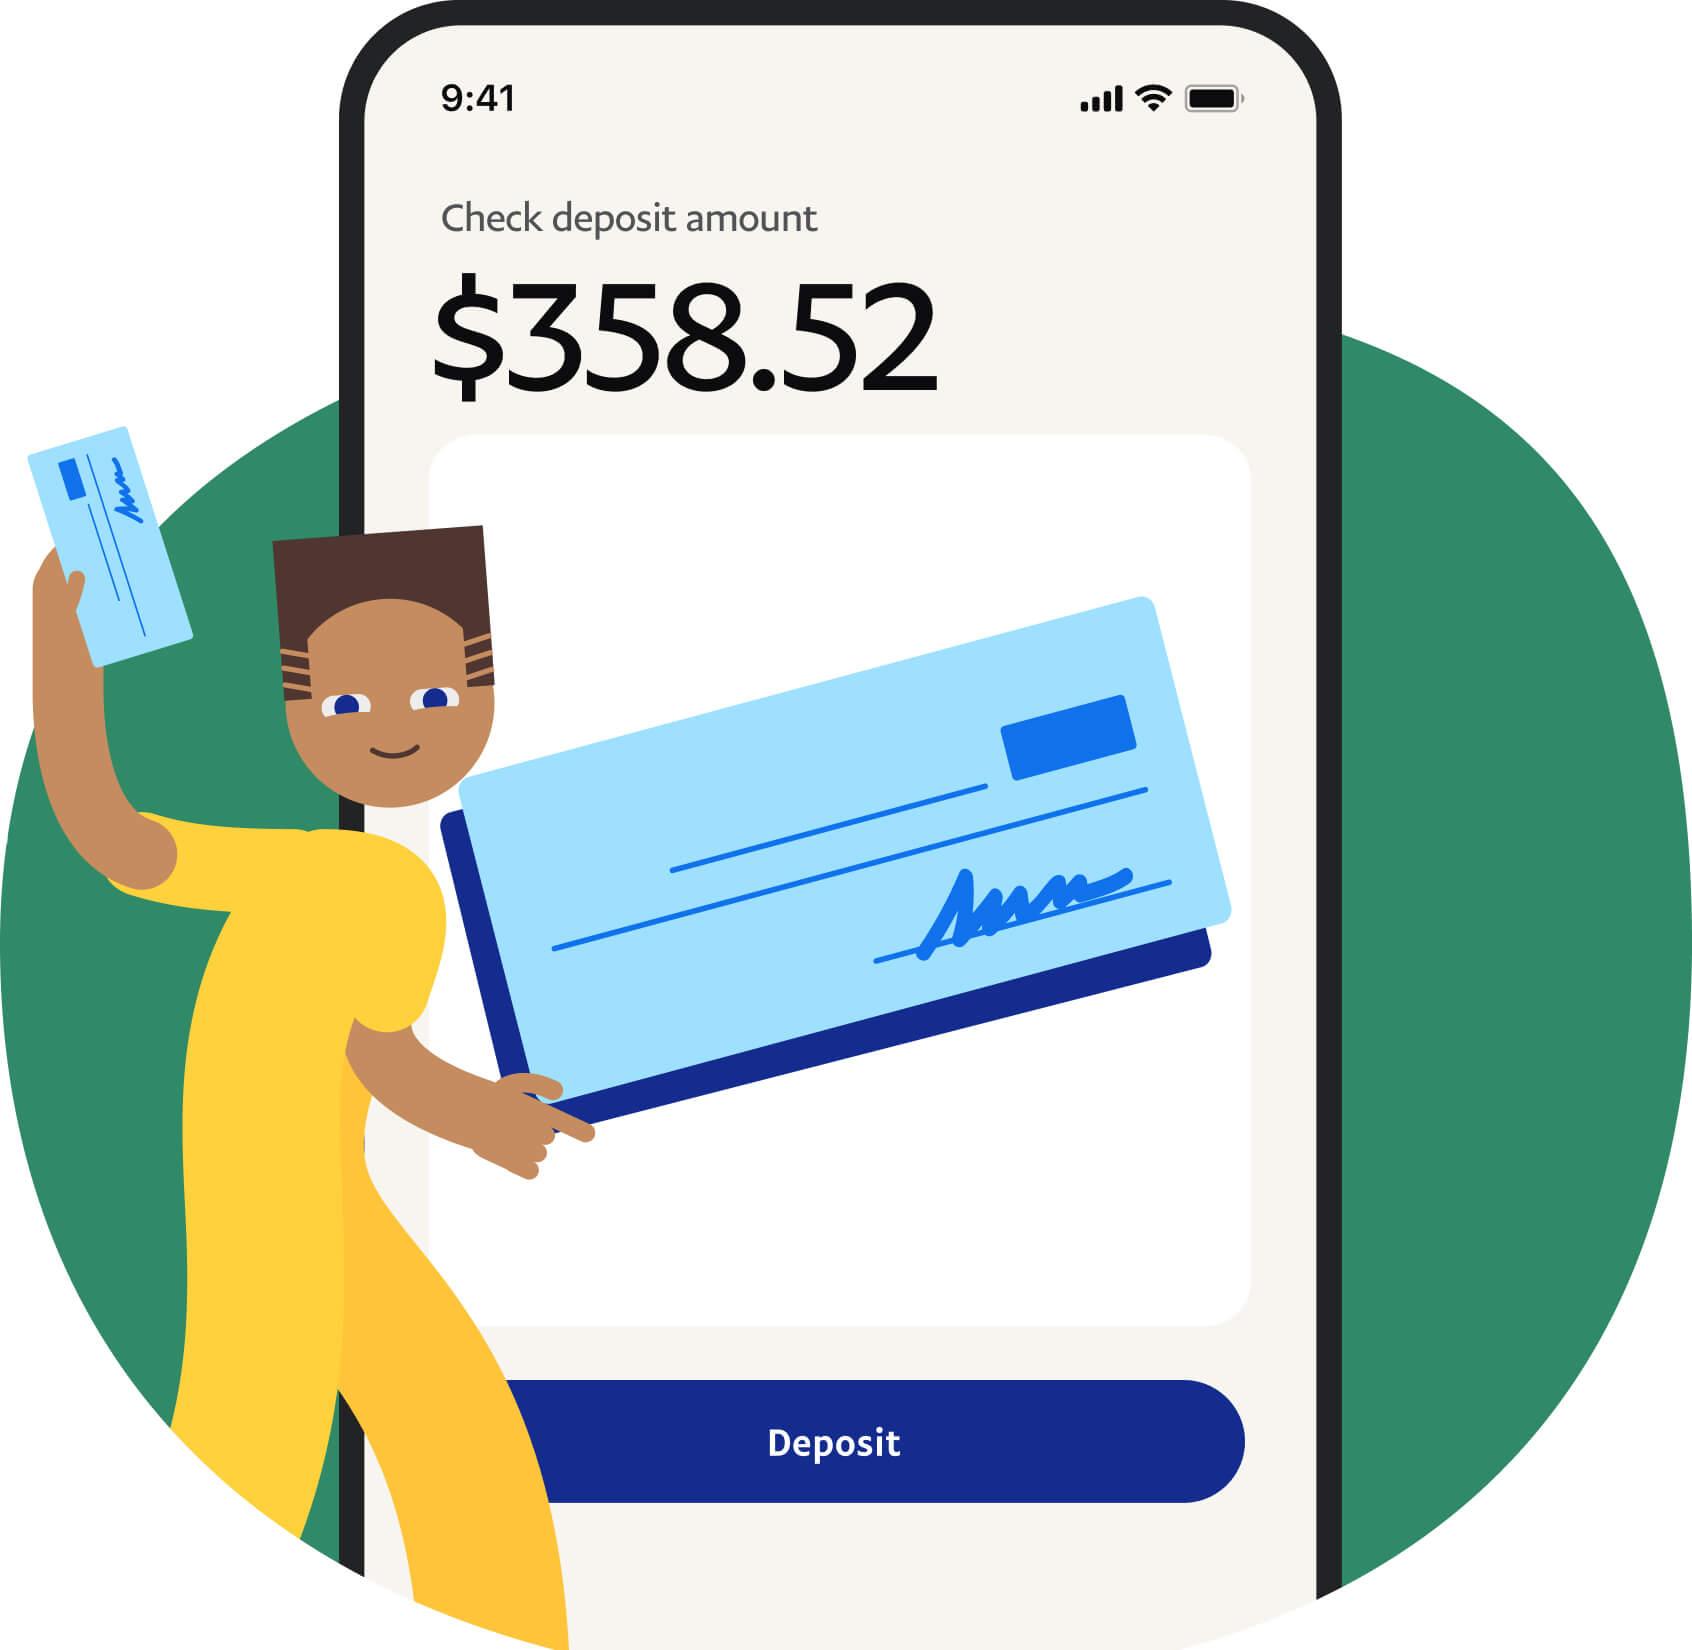 PayPal Check deposit amount